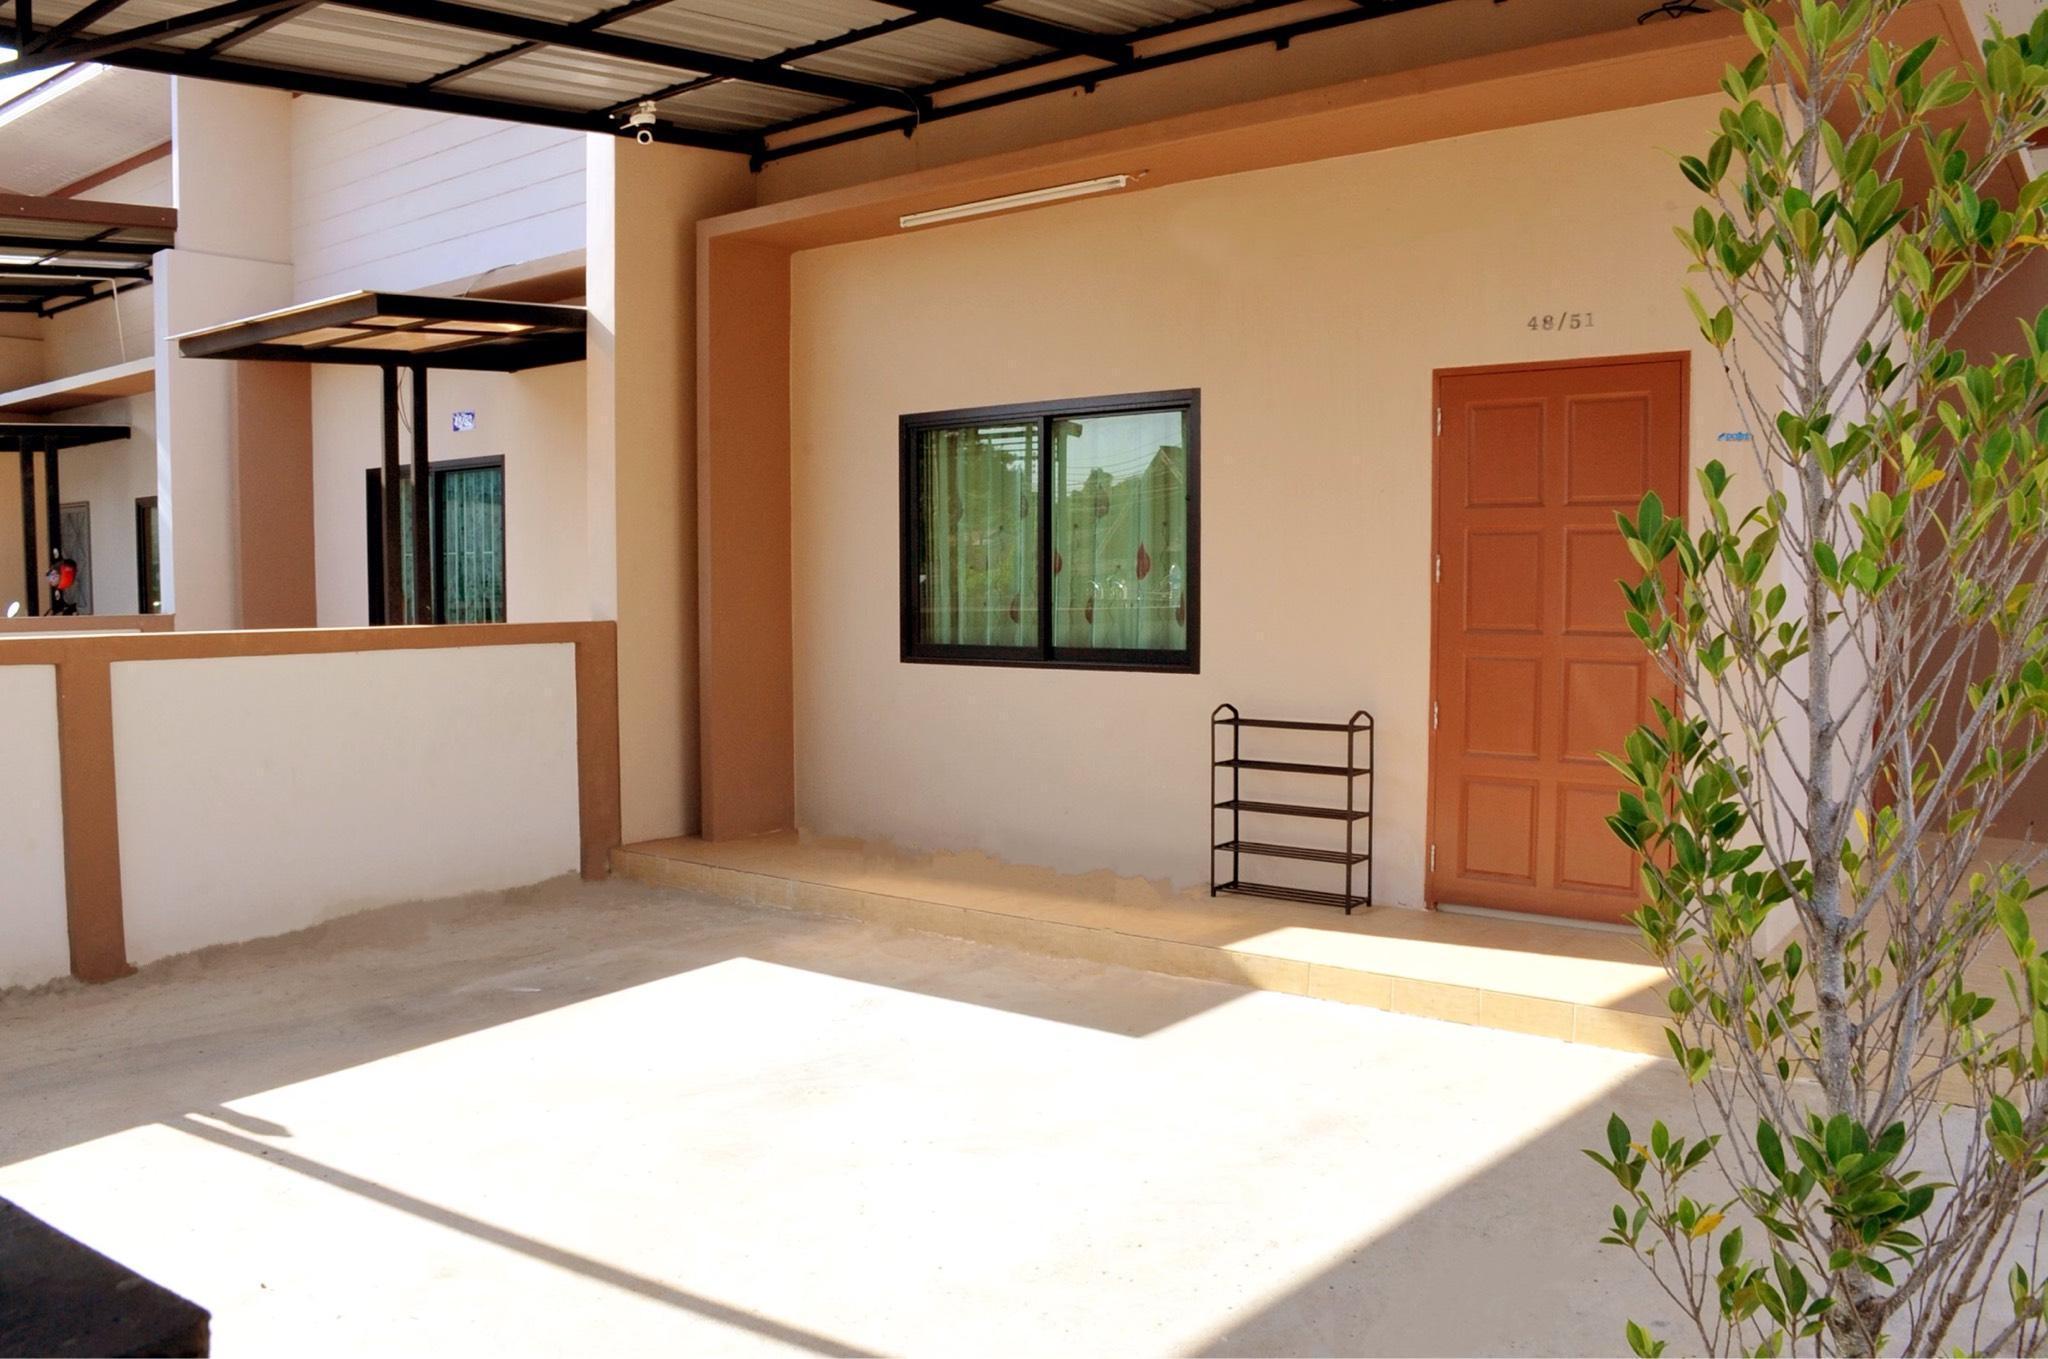 The Cozy Home @ Krabi Town บ้านเดี่ยว 1 ห้องนอน 1 ห้องน้ำส่วนตัว ขนาด 47 ตร.ม. – ตัวเมืองกระบี่